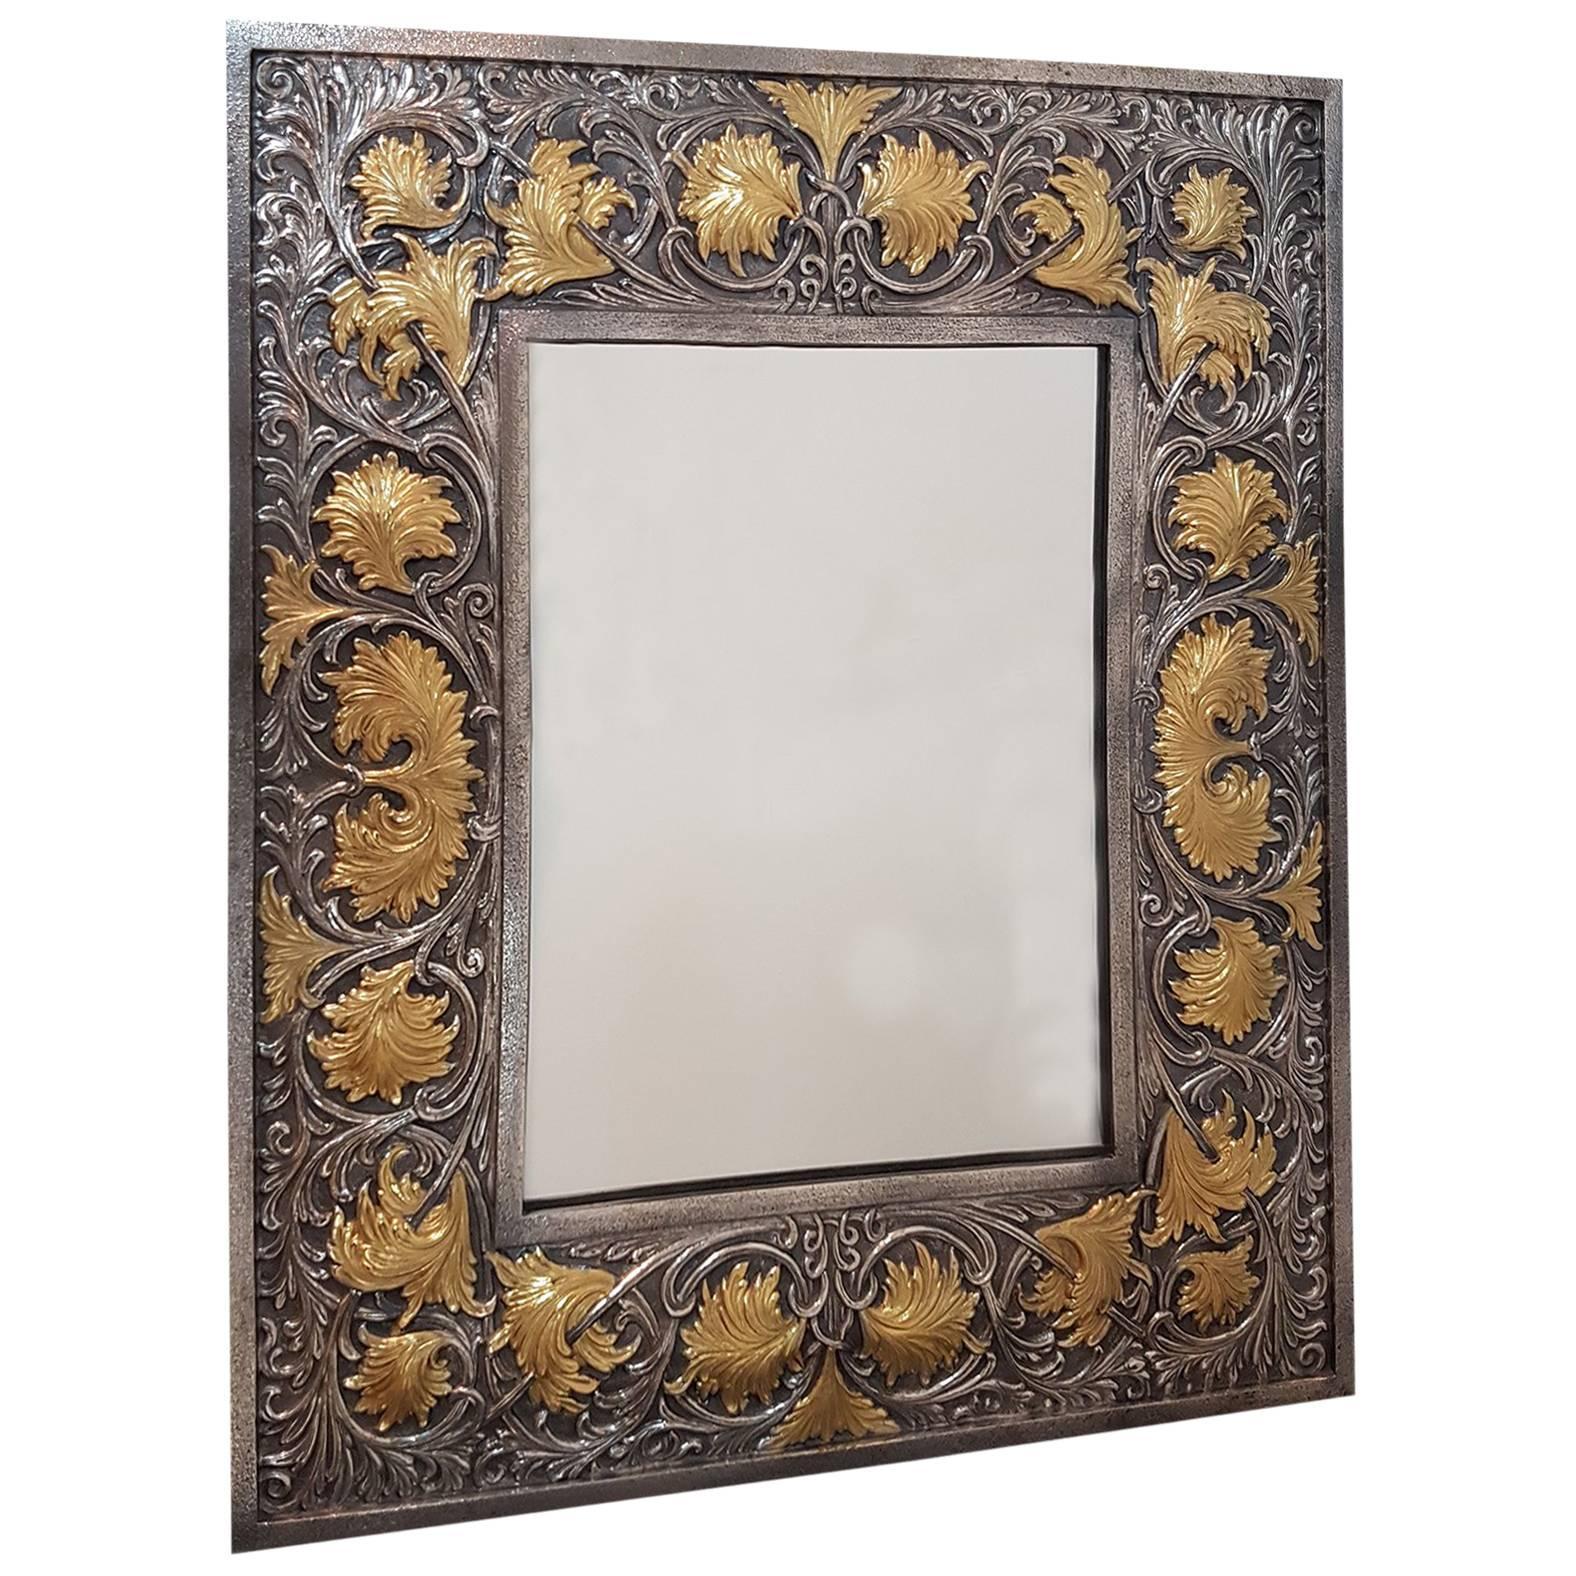 20th Century Italian Sterling Silver Handmade Table Mirror Baroque revival